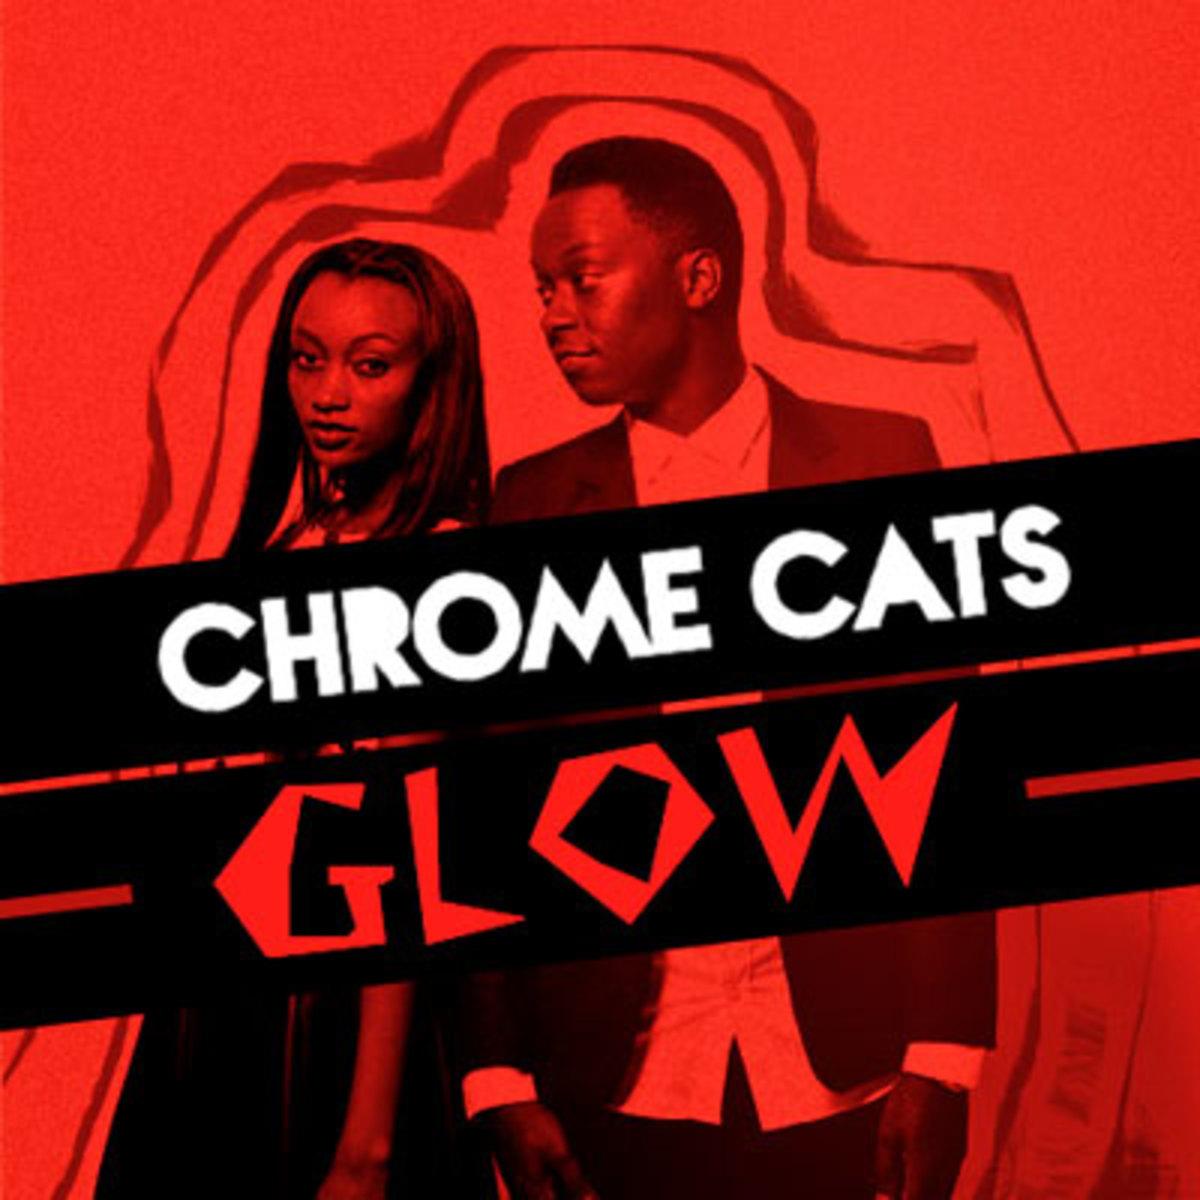 chromecats-glow.jpg